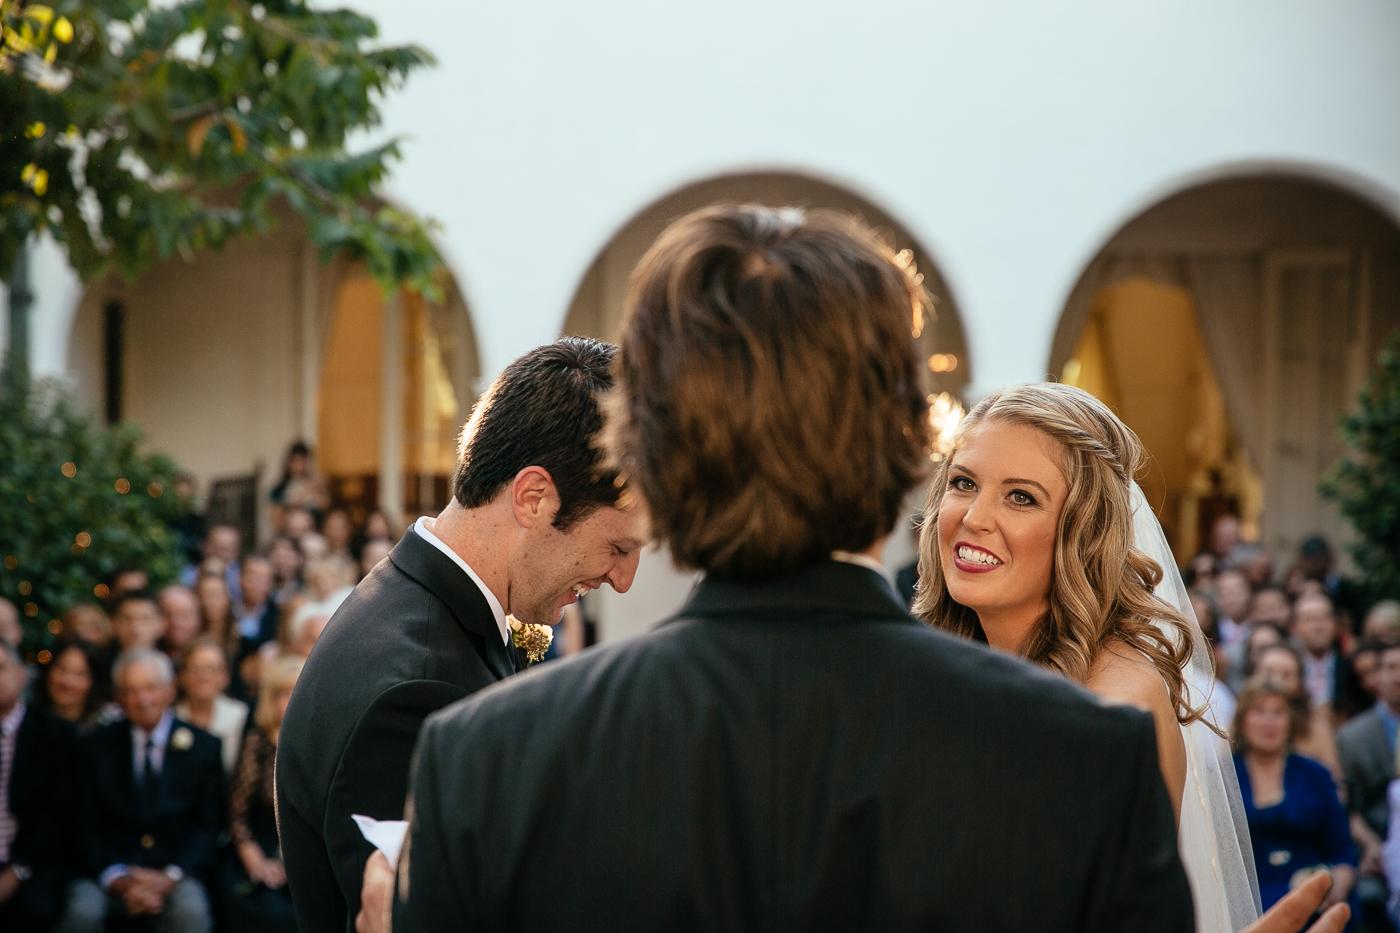 RYAN_&_KELLEY_DARLINGTON_HOUSE_WEDDING_2014_7X9A2091.JPG